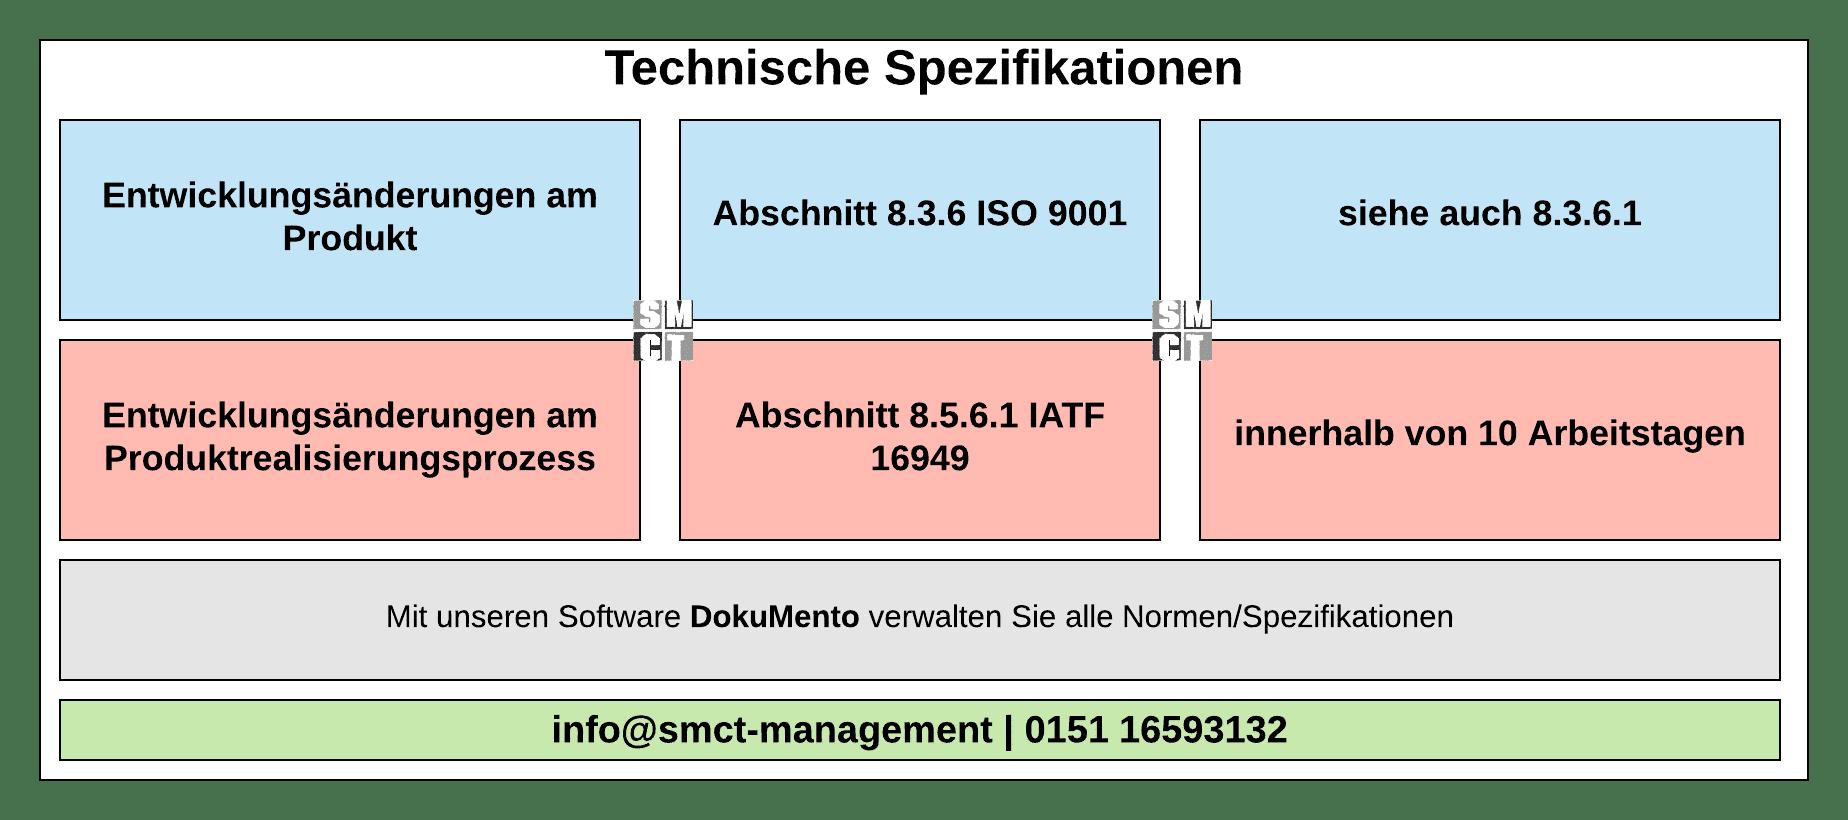 Technische Spezifikationen Specs | SMCT-MANAGEMENT